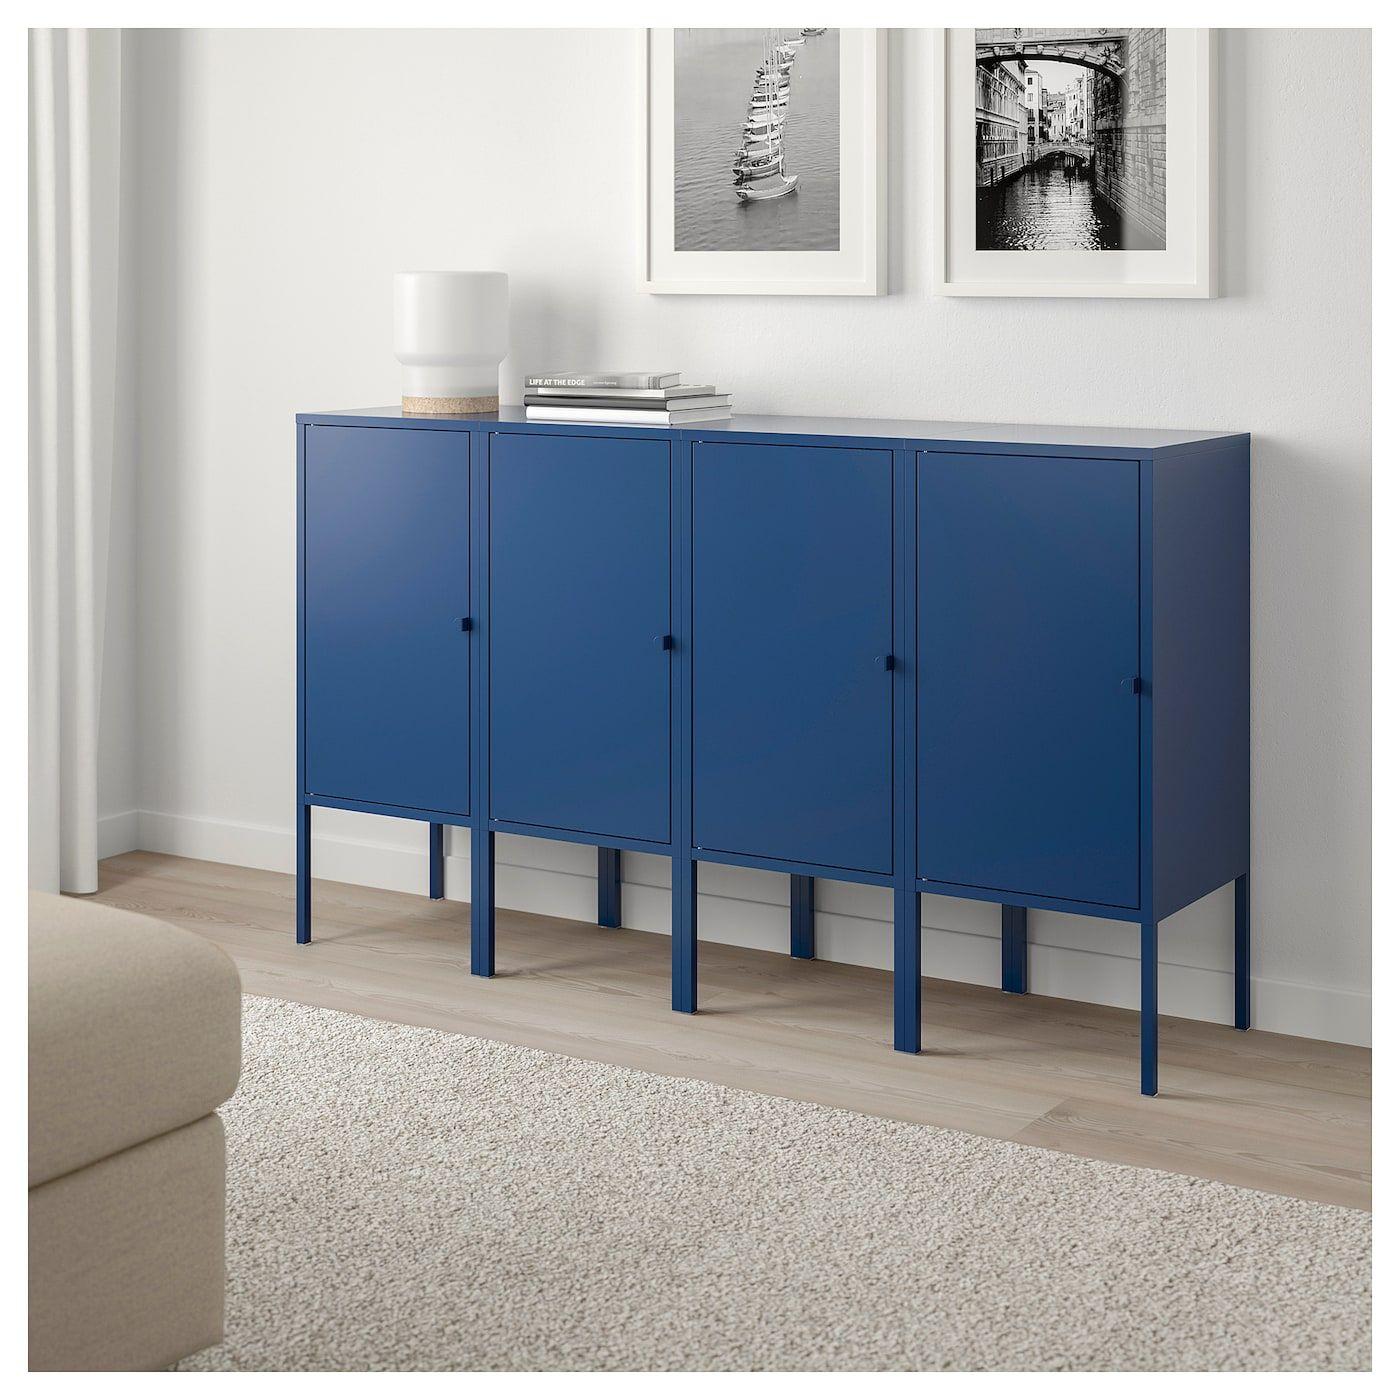 Lixhult Storage Combination Dark Blue 55 1 8x32 1 4 Ikea Metal Storage Cabinets Ikea Storage